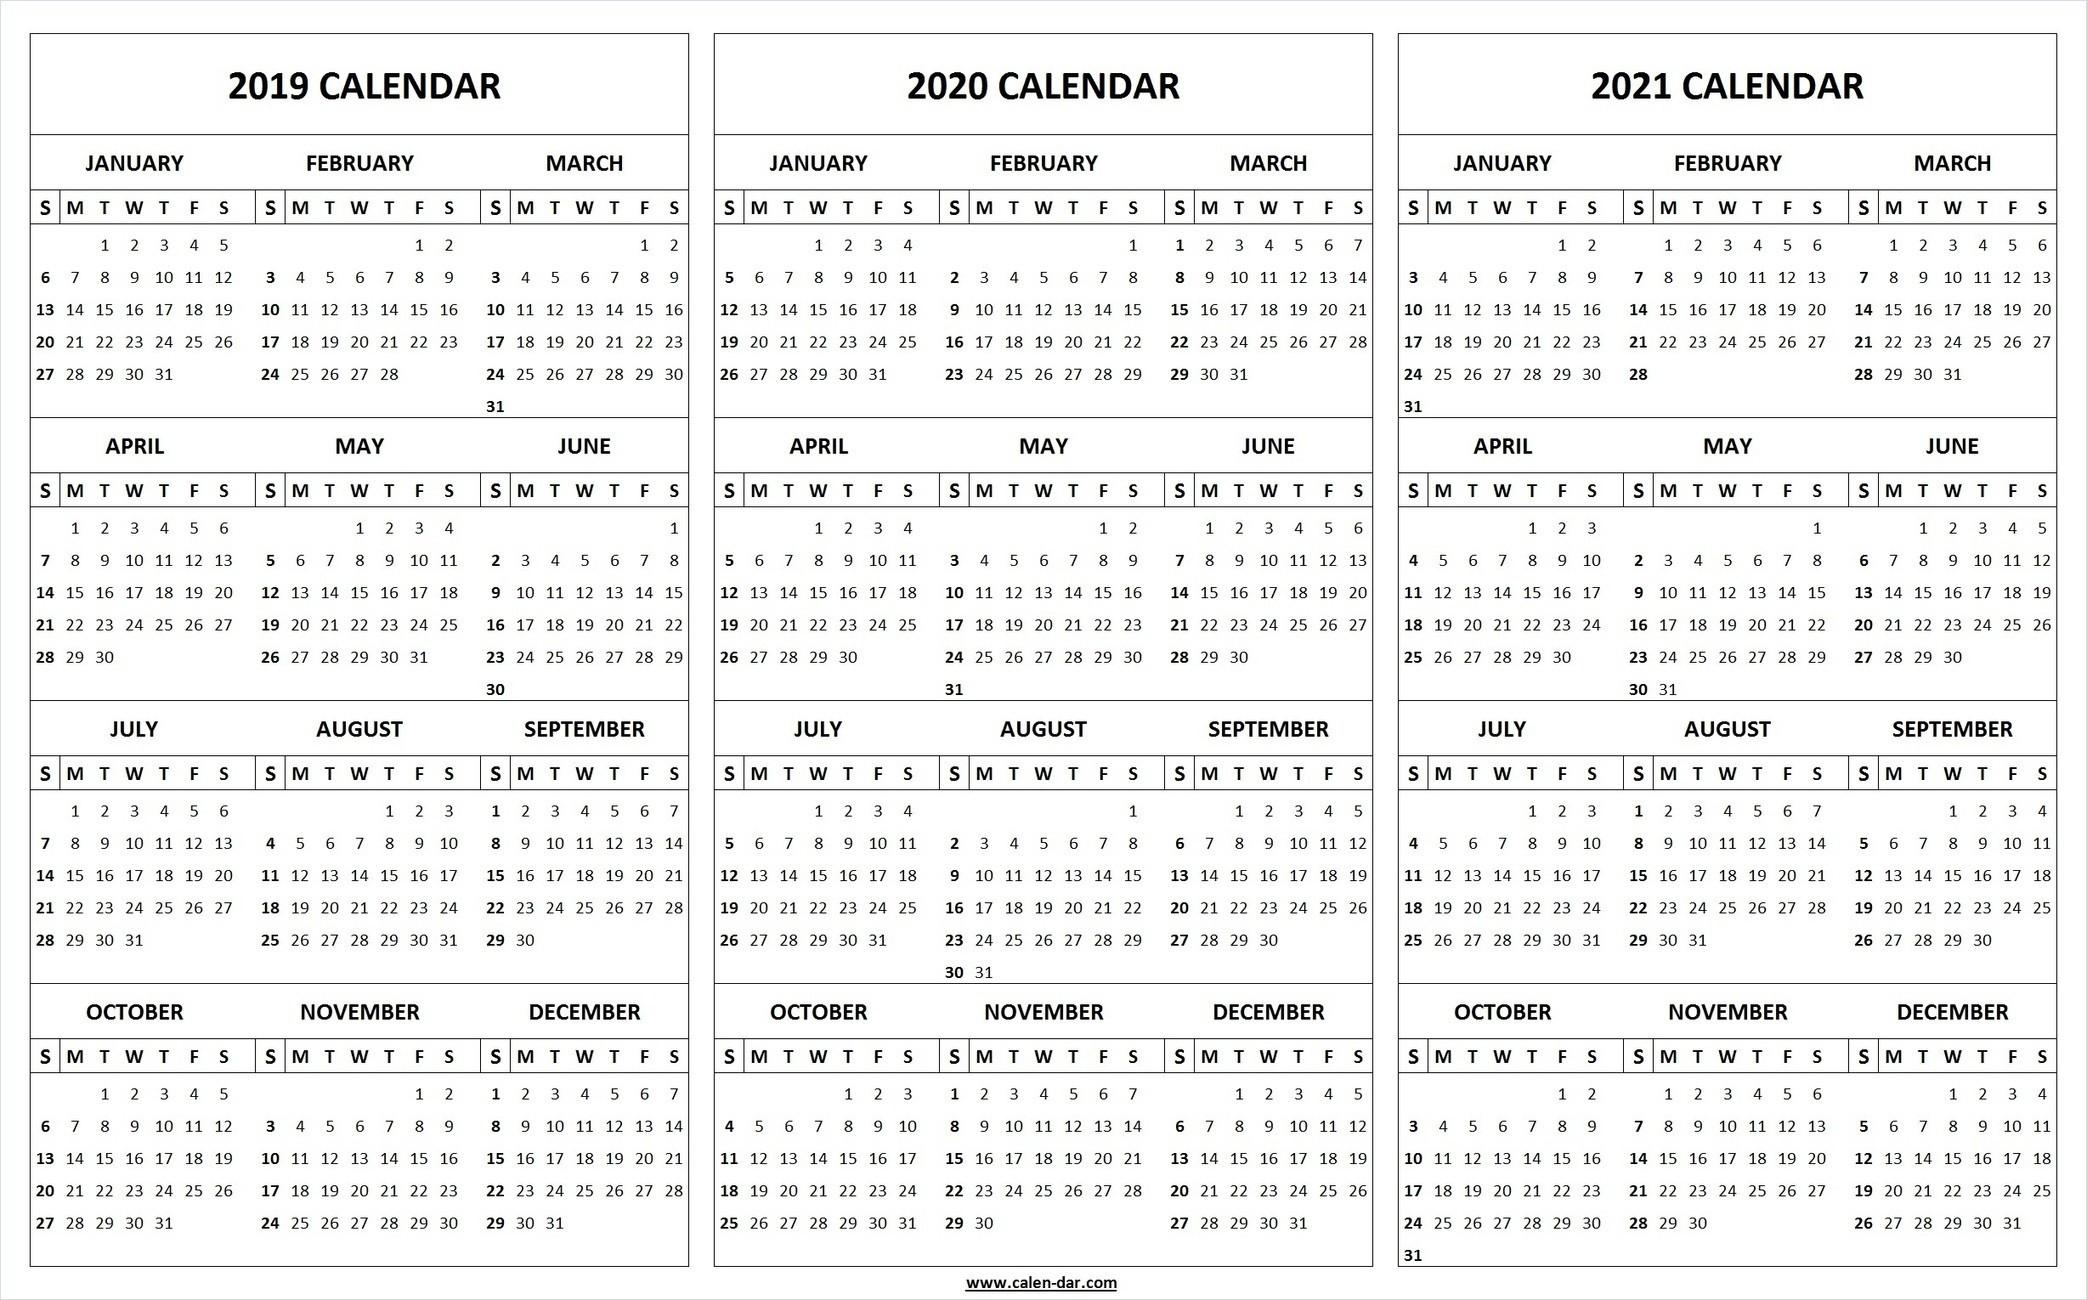 Calendario Chile 2020.Prueba Calendario 2019 Chile Para Imprimir Marzo